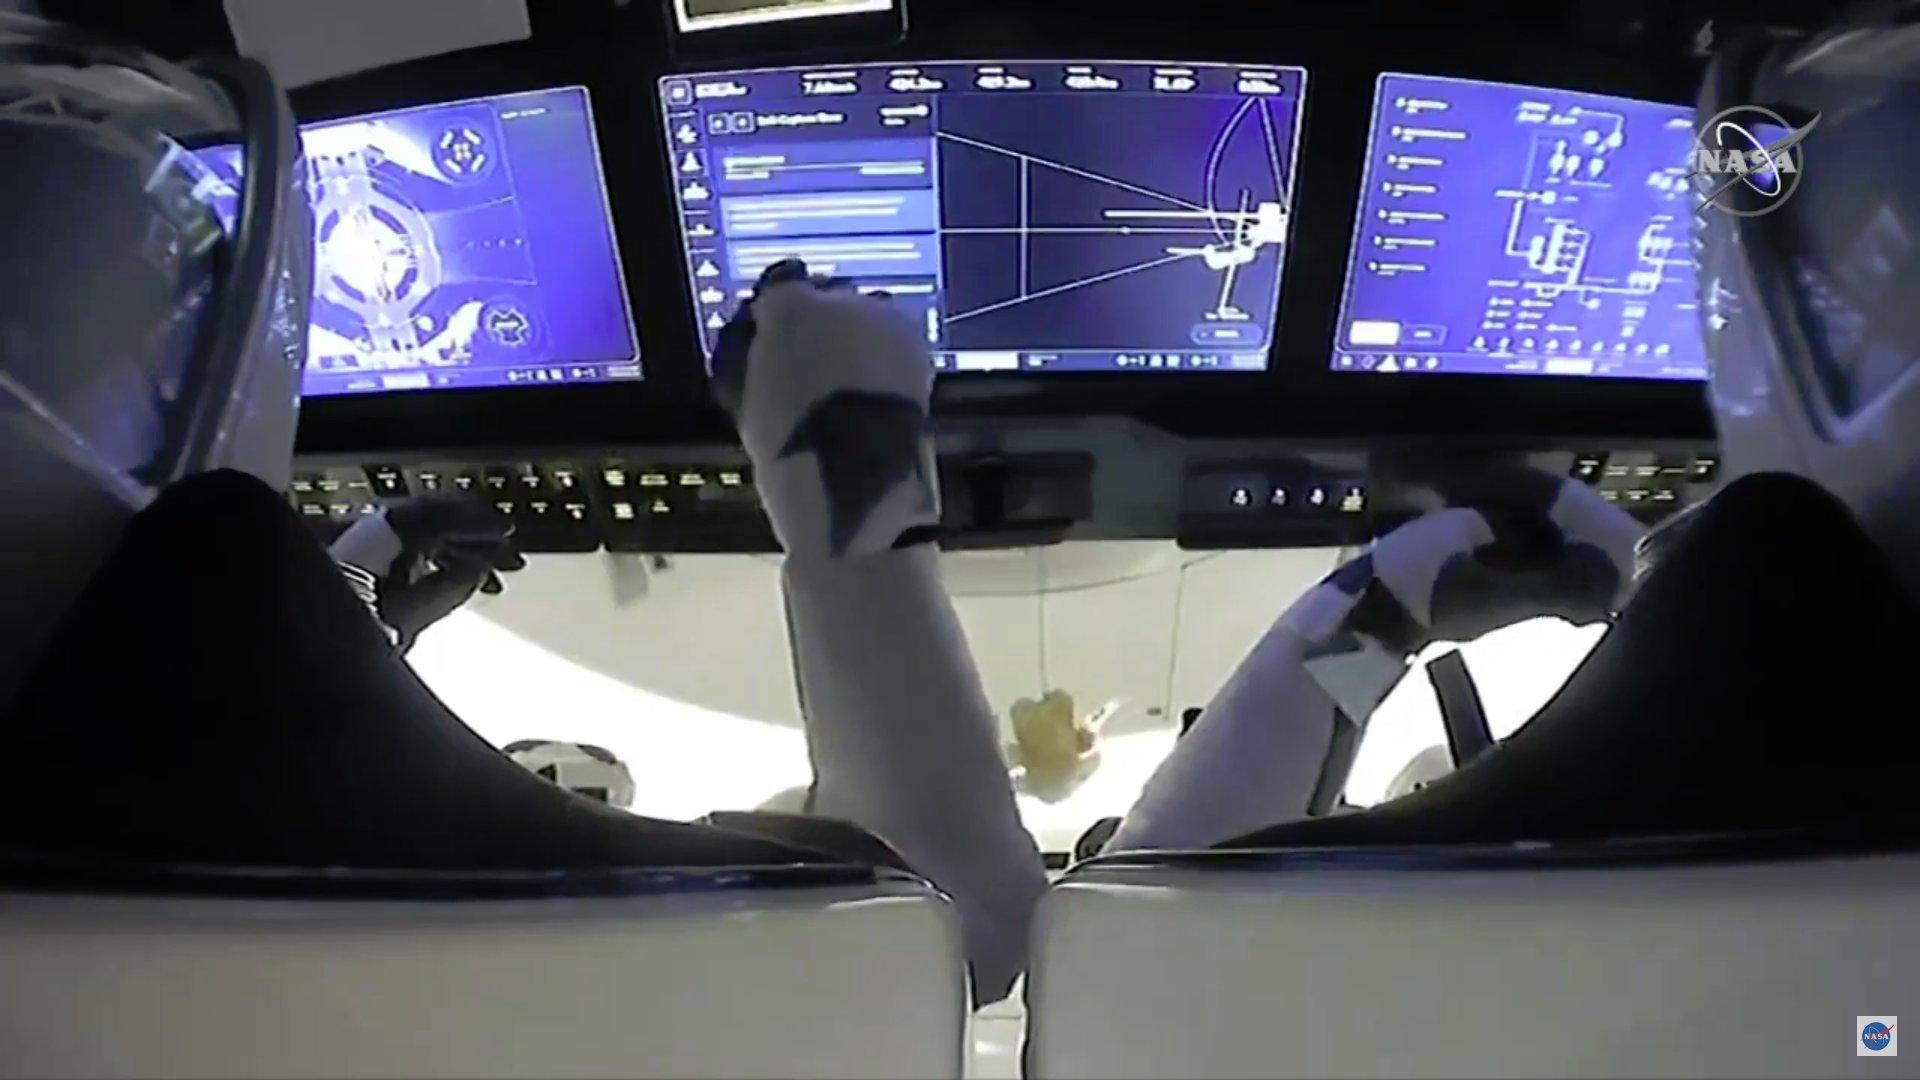 2020-17-nov-crew-dragon-docked.jpg